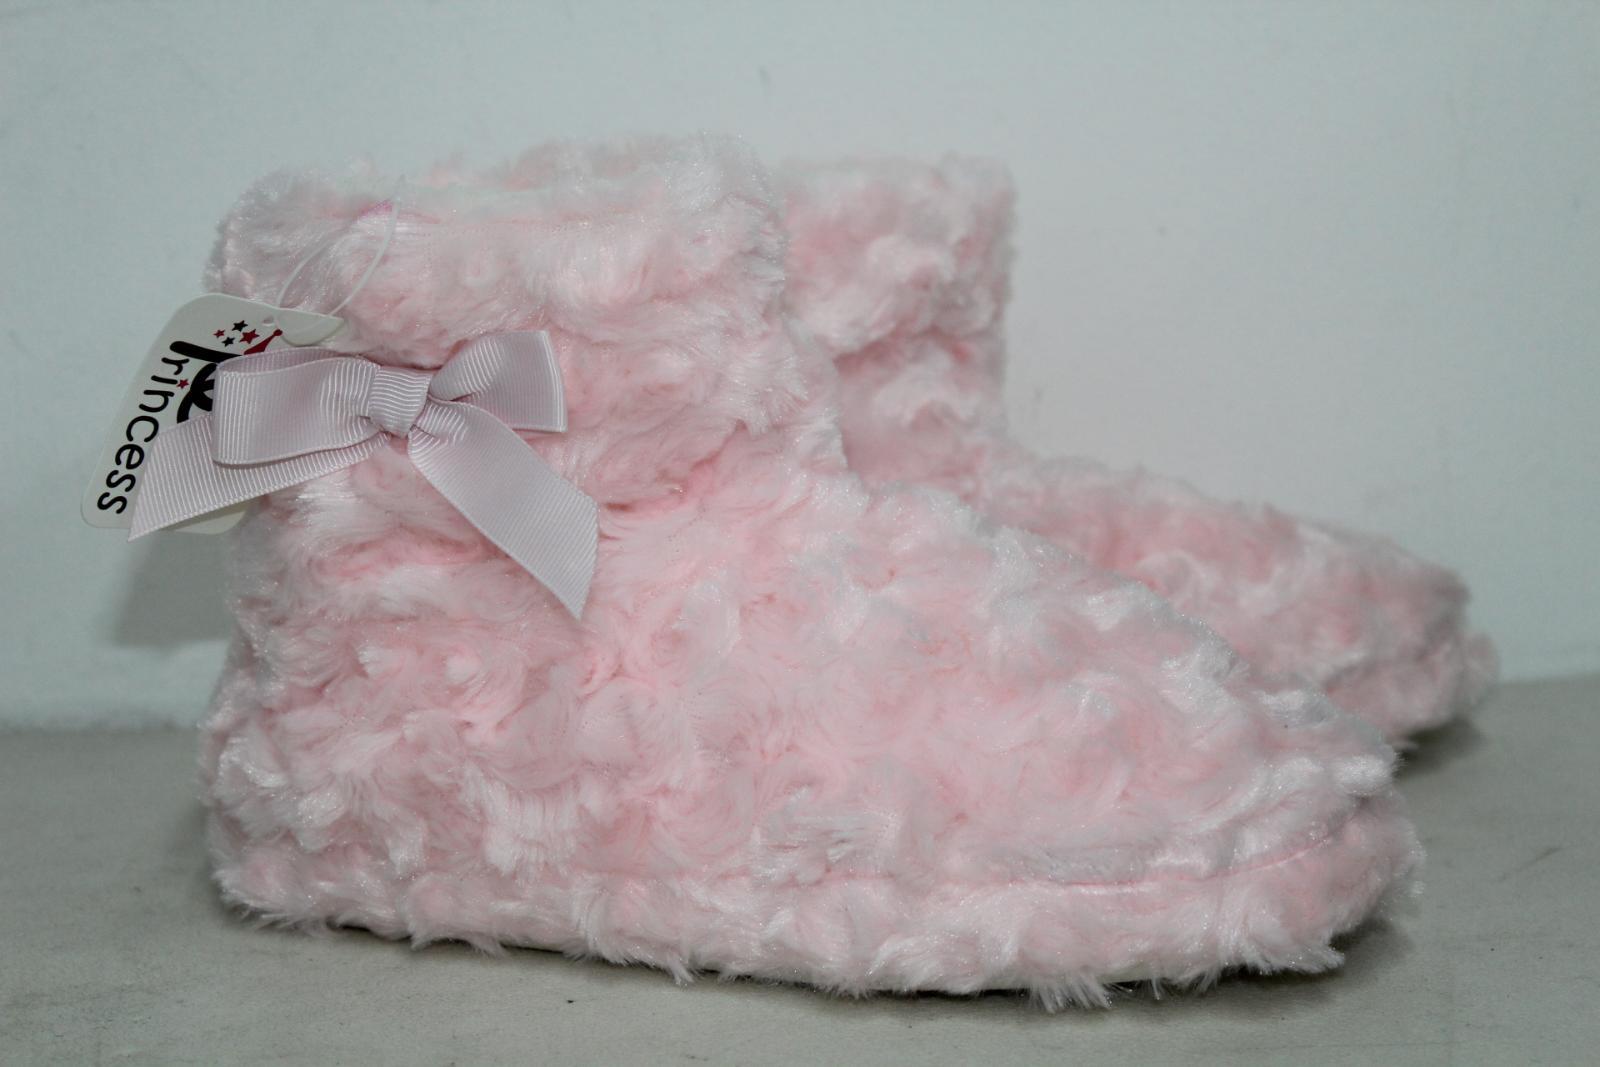 CHIC PRINCESS Girls Pink Fluffy Winter Warm Slipper Shoe Boots UK5 EU38 BNWT 2